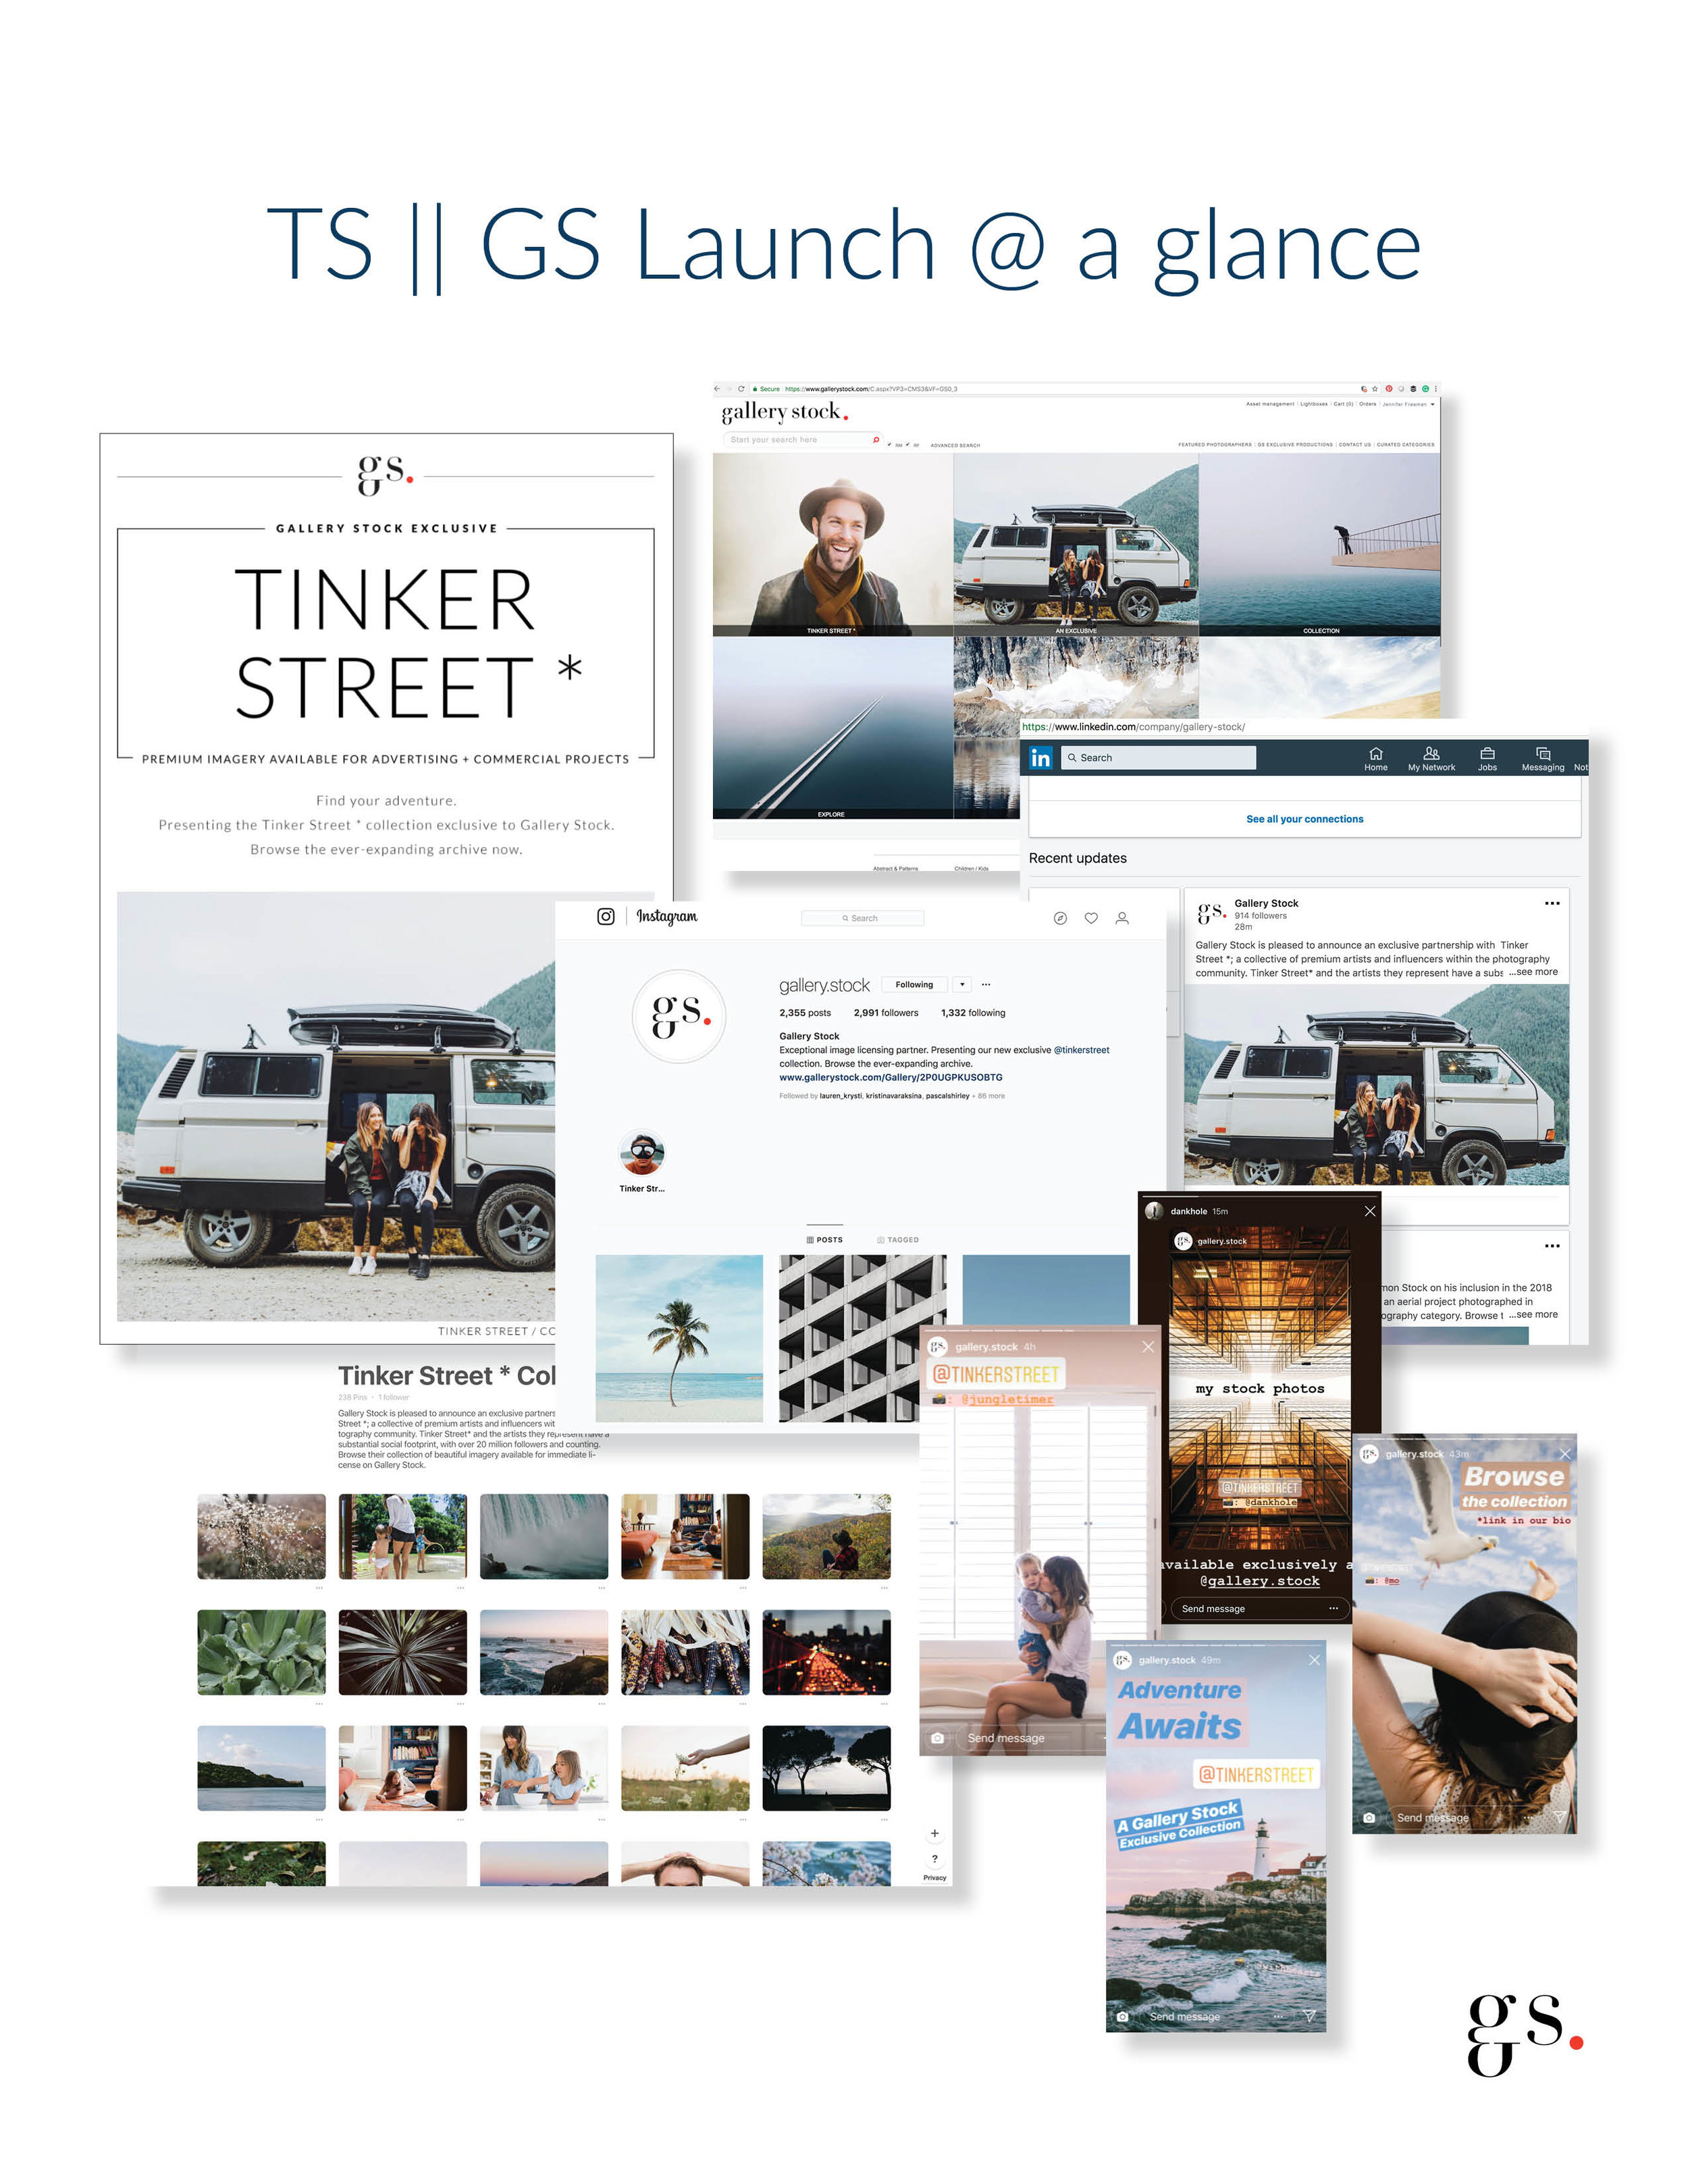 TS_GS_Launch.jpg